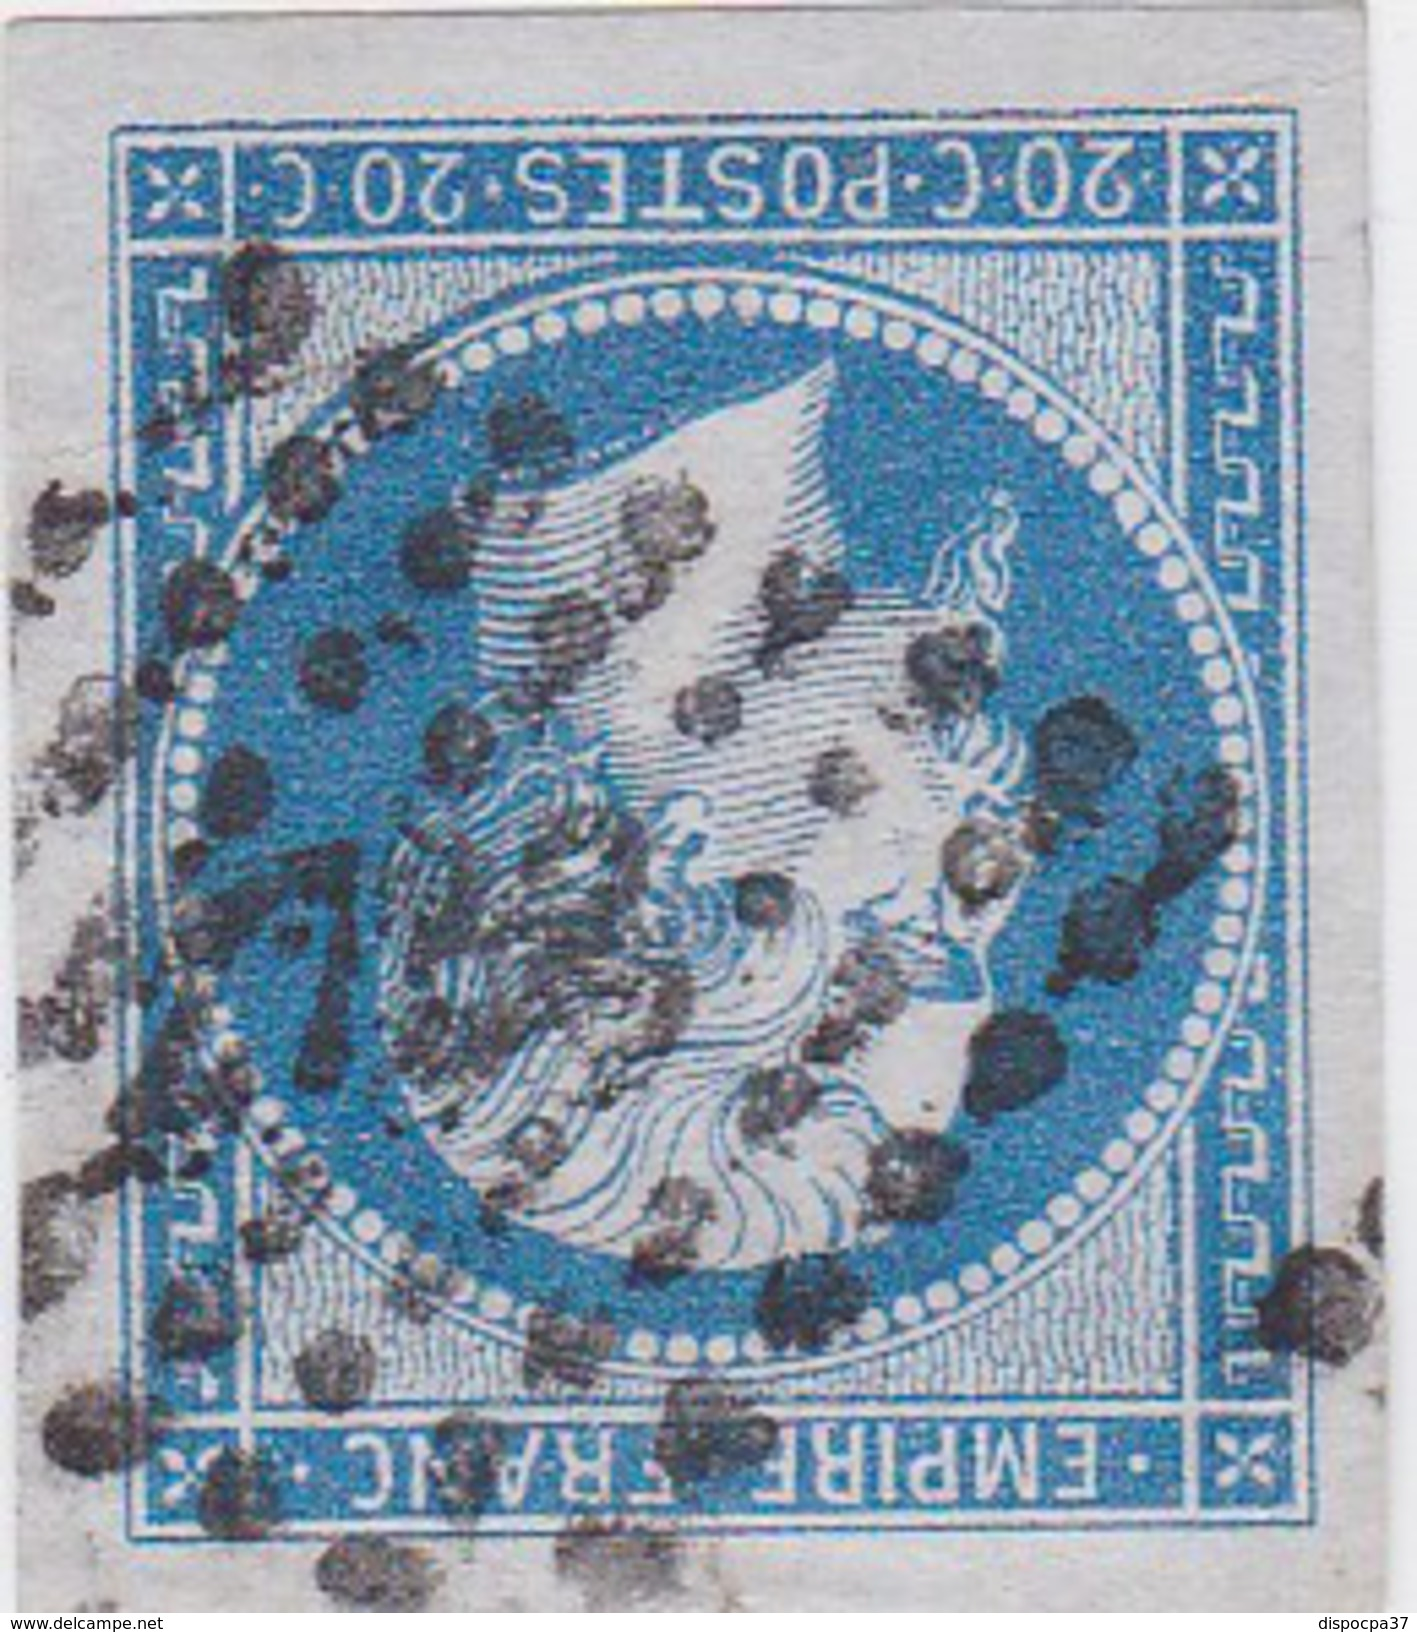 N° 14 A   PC  2733    ROSNAY L' HOPITAL  /  AUBE    - LOT 10332  - TRES BEAU BORD DE FEUILLE   INDICE 14 COTE 120€ - 1853-1860 Napoleon III